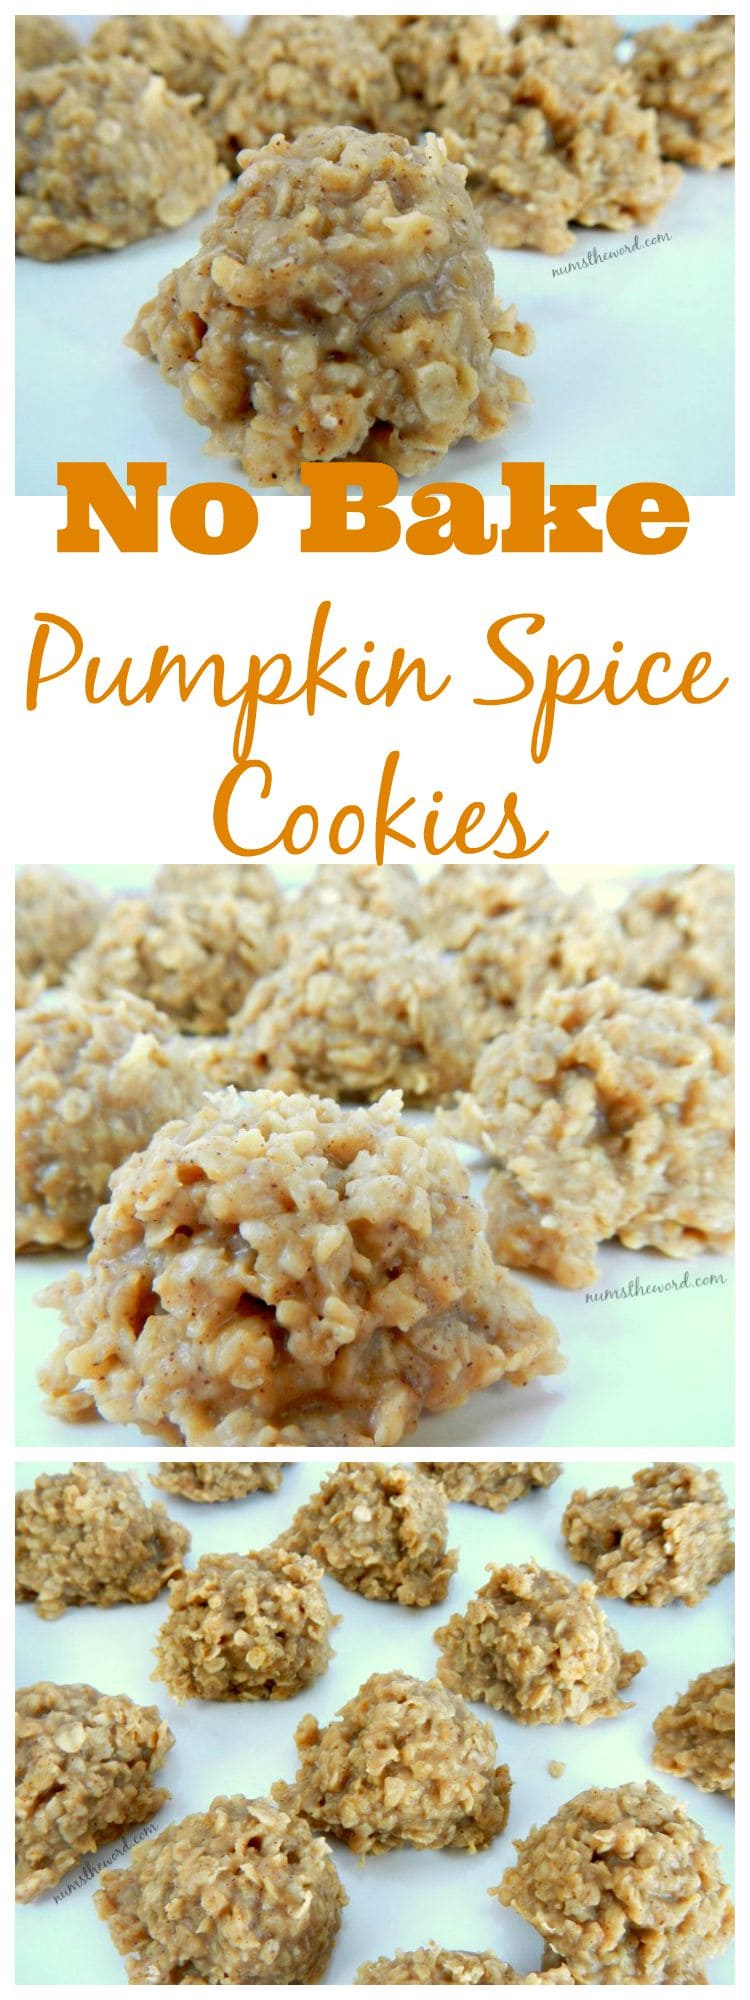 No Bake Pumpkin Spice Cookies